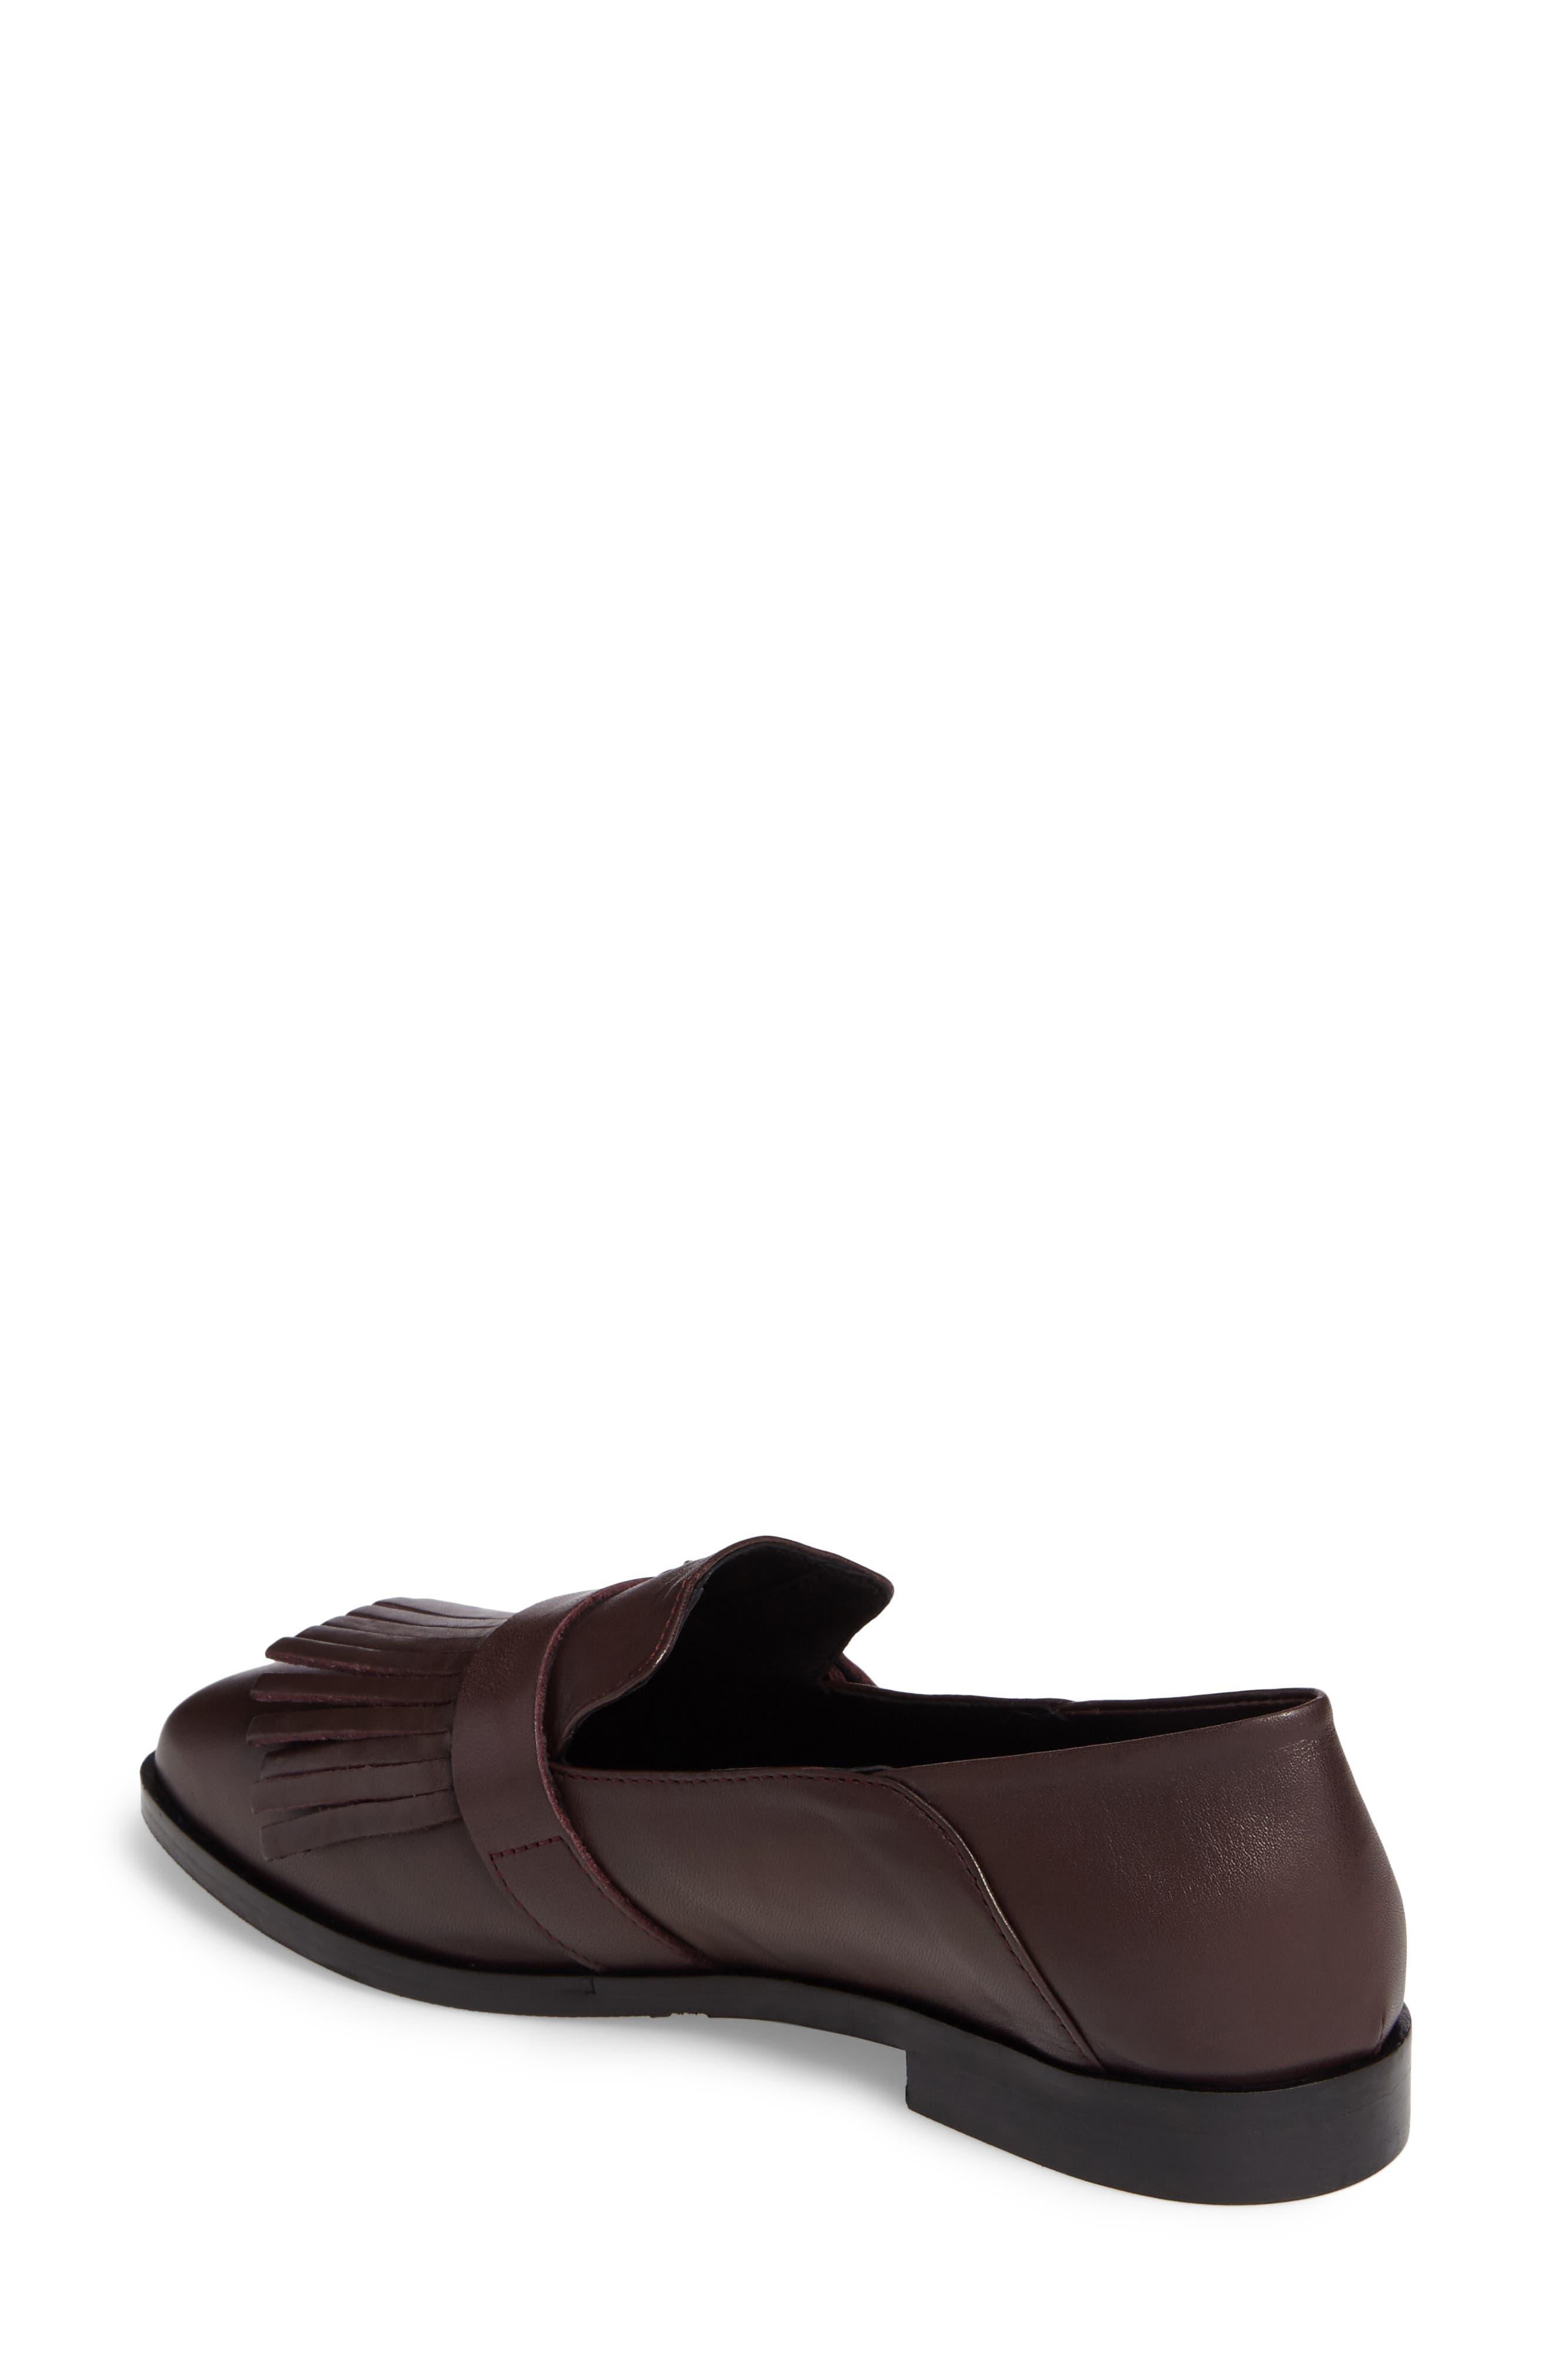 Dame Fringed Loafer Flat,                             Alternate thumbnail 2, color,                             Burgundy Leather